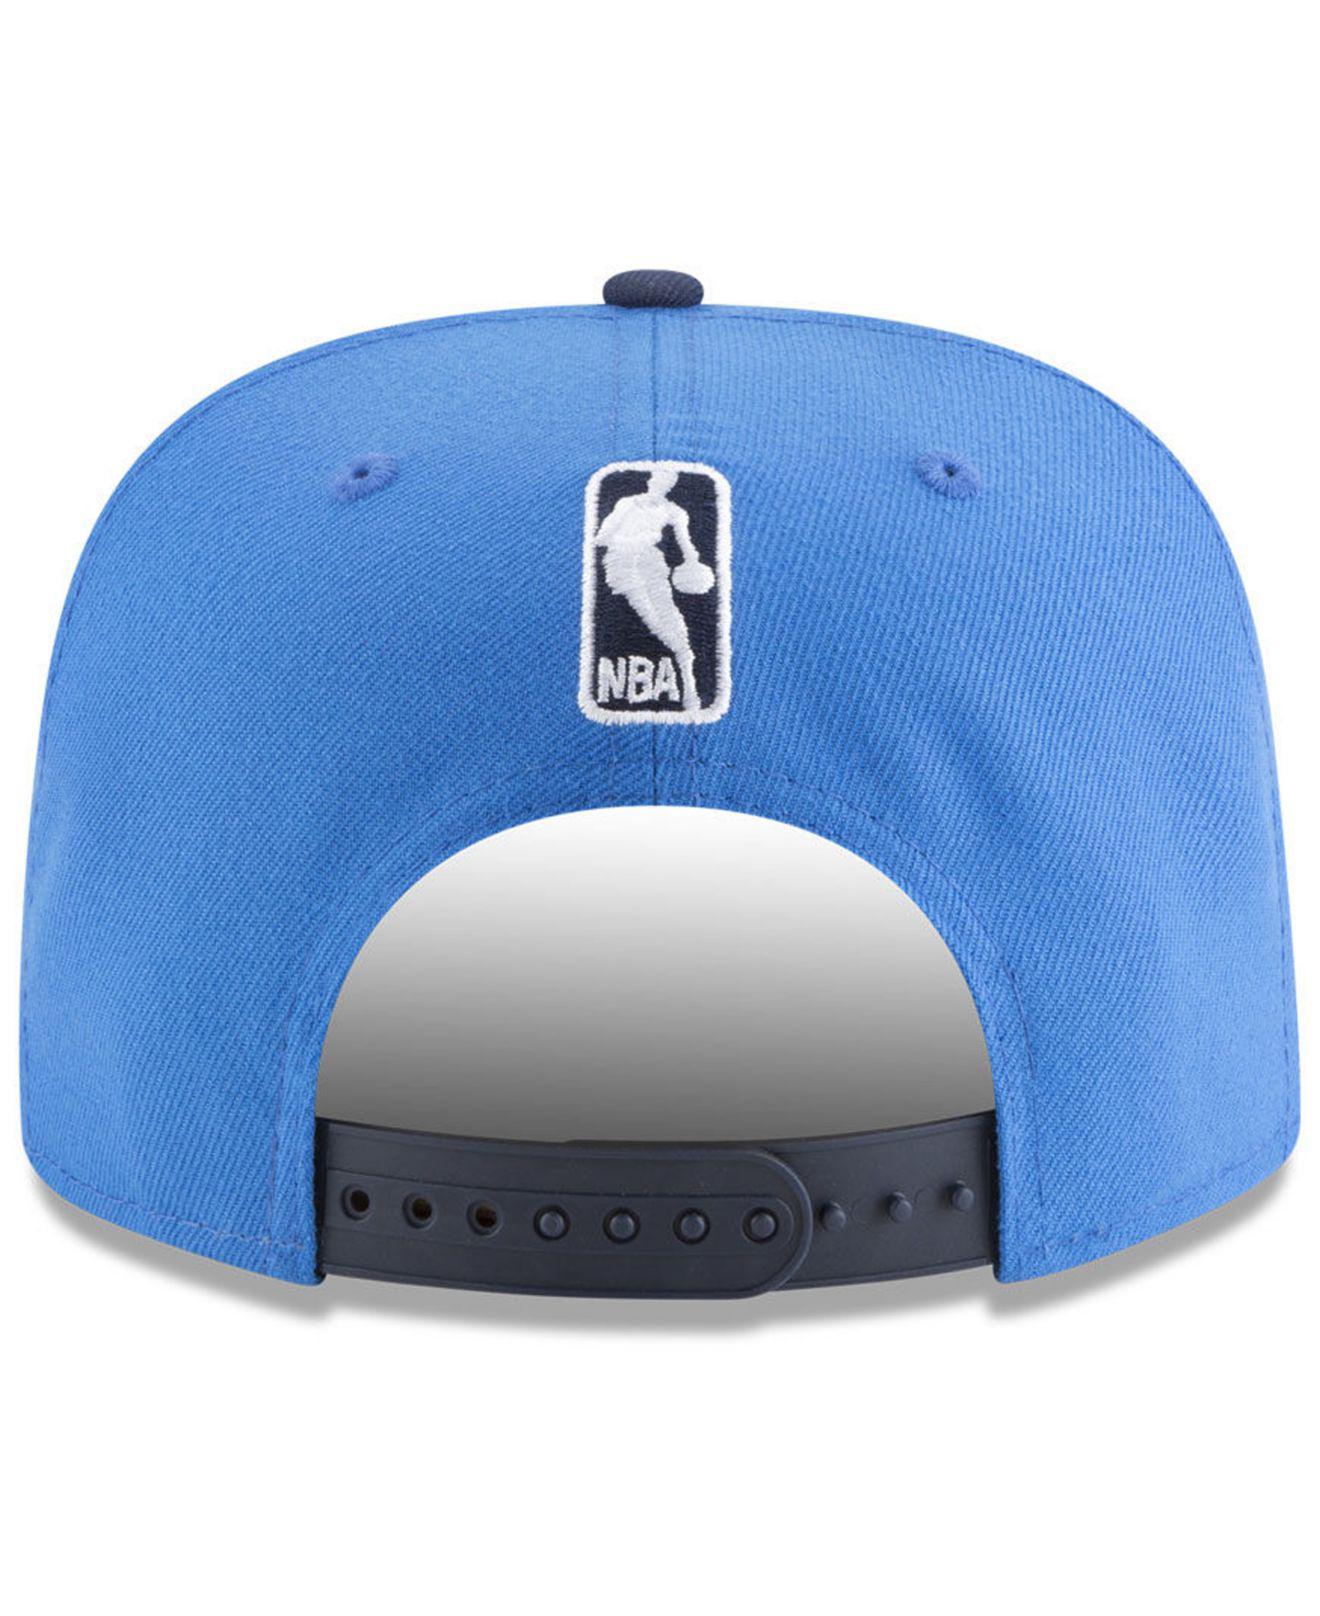 wholesale dealer 48cef f0df3 shop oklahoma city thunder retro tail 9fifty snapback cap for men lyst.  view fullscreen 648aa